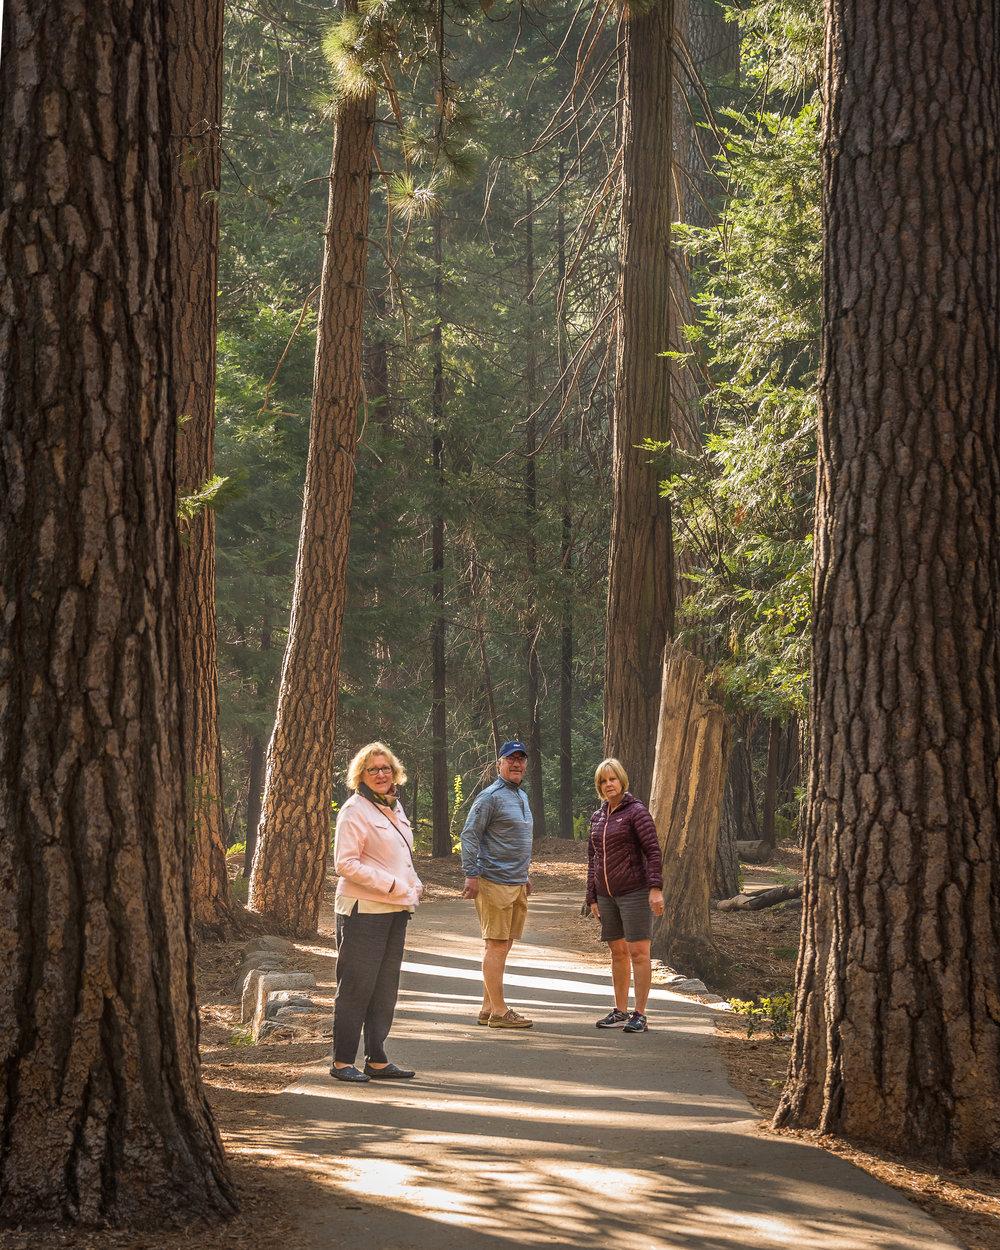 NAPA-Yosemite-64.jpg